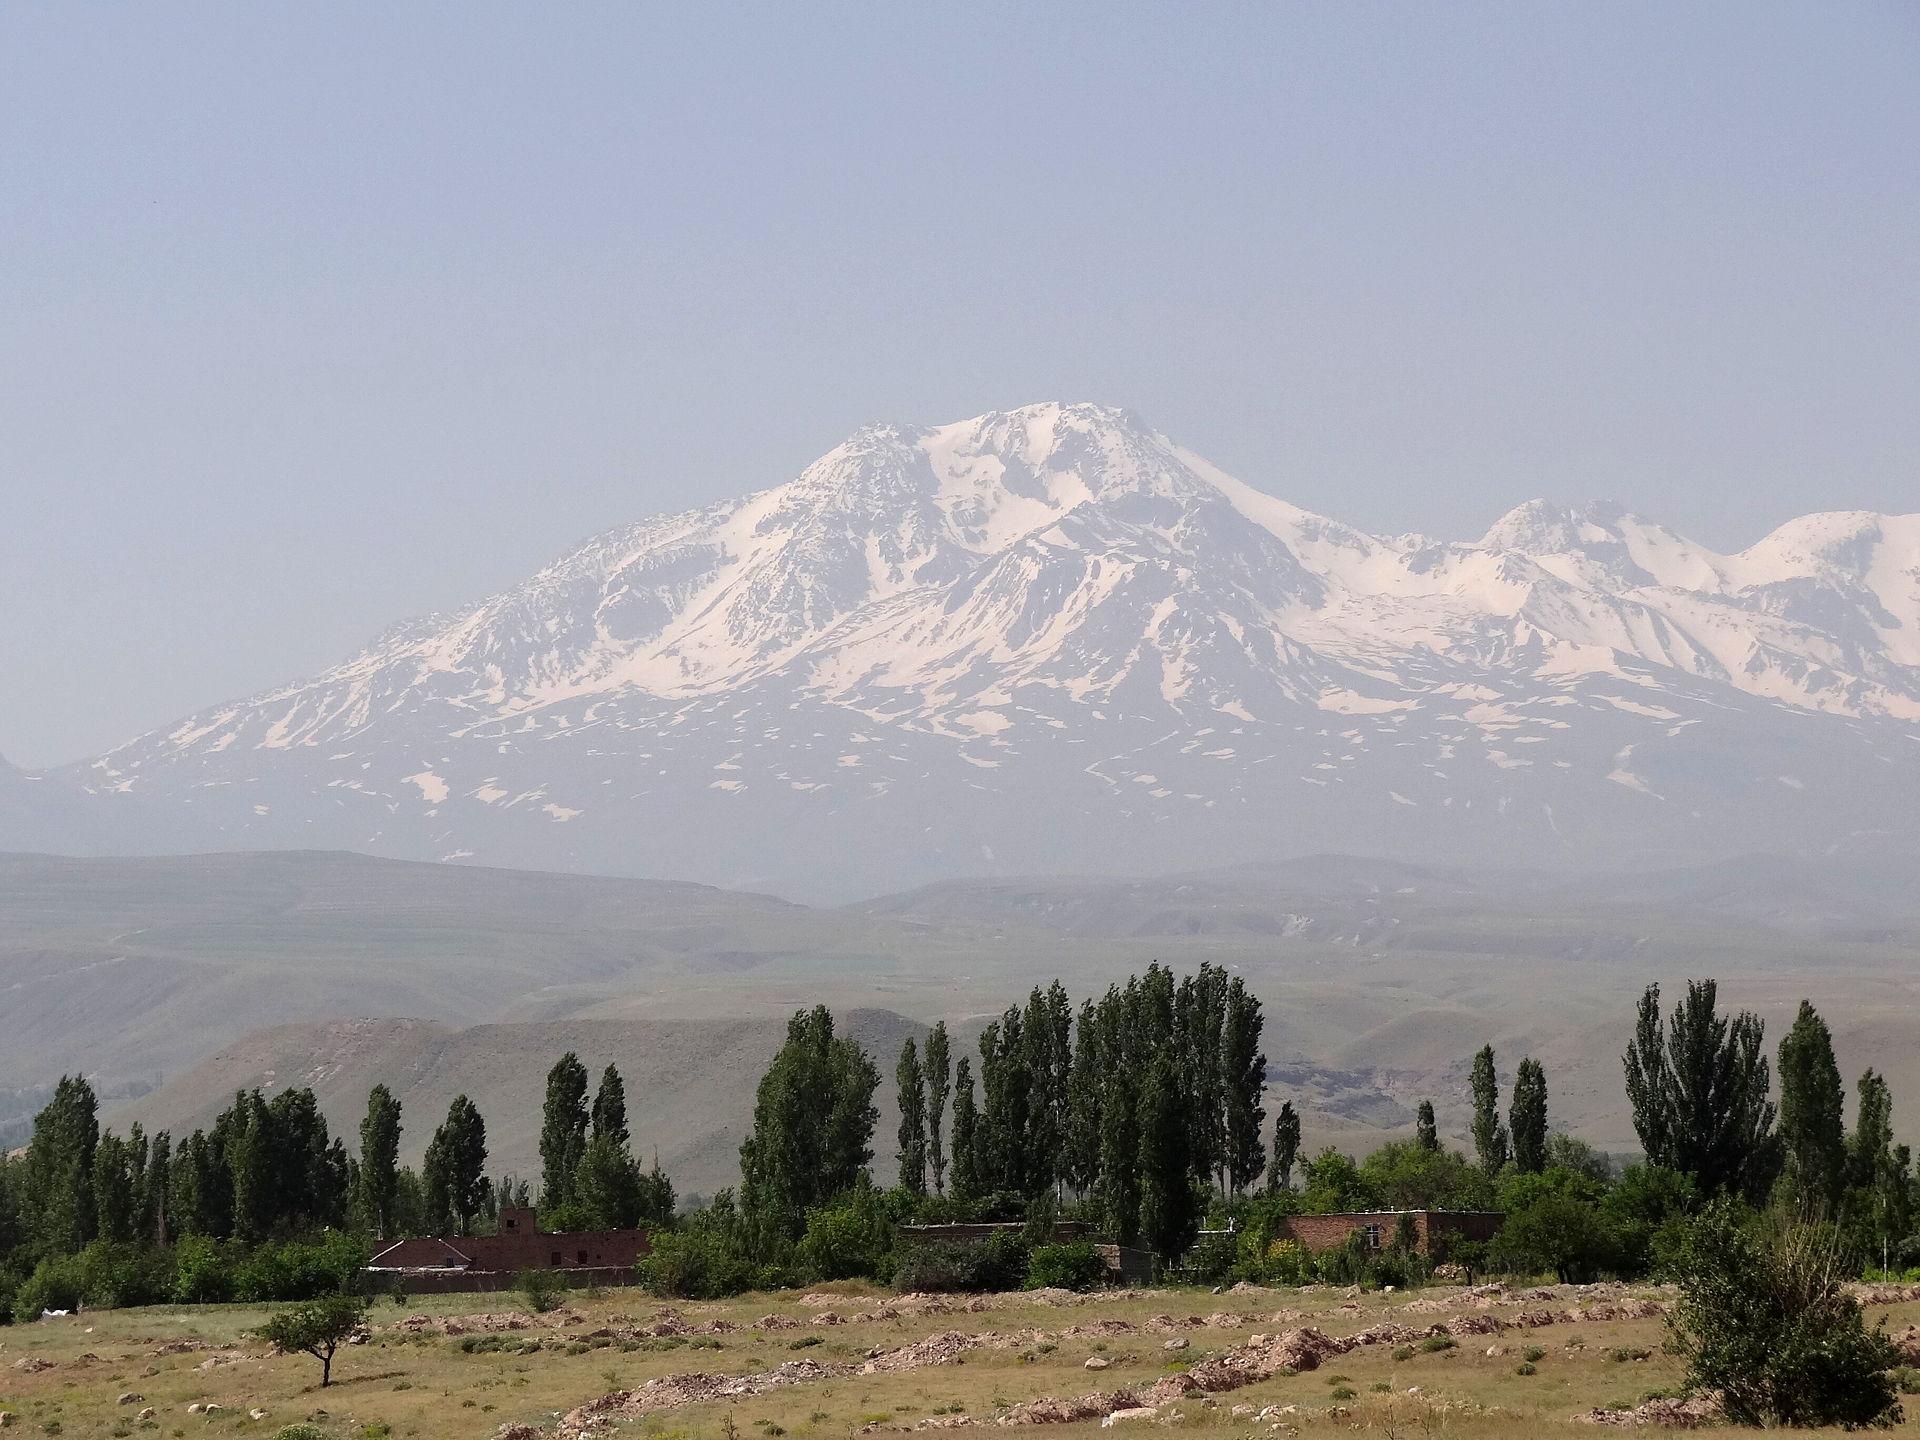 Gunung Sabalan   By Adam Jones - Flickr: Mt. Sabalan (4811 Metres) Viewed from Highway near Ardabil - Iranian Azerbaijan - Iran, CC BY-SA 2.0, https://commons.wikimedia.org/w/index.php?curid=32349649